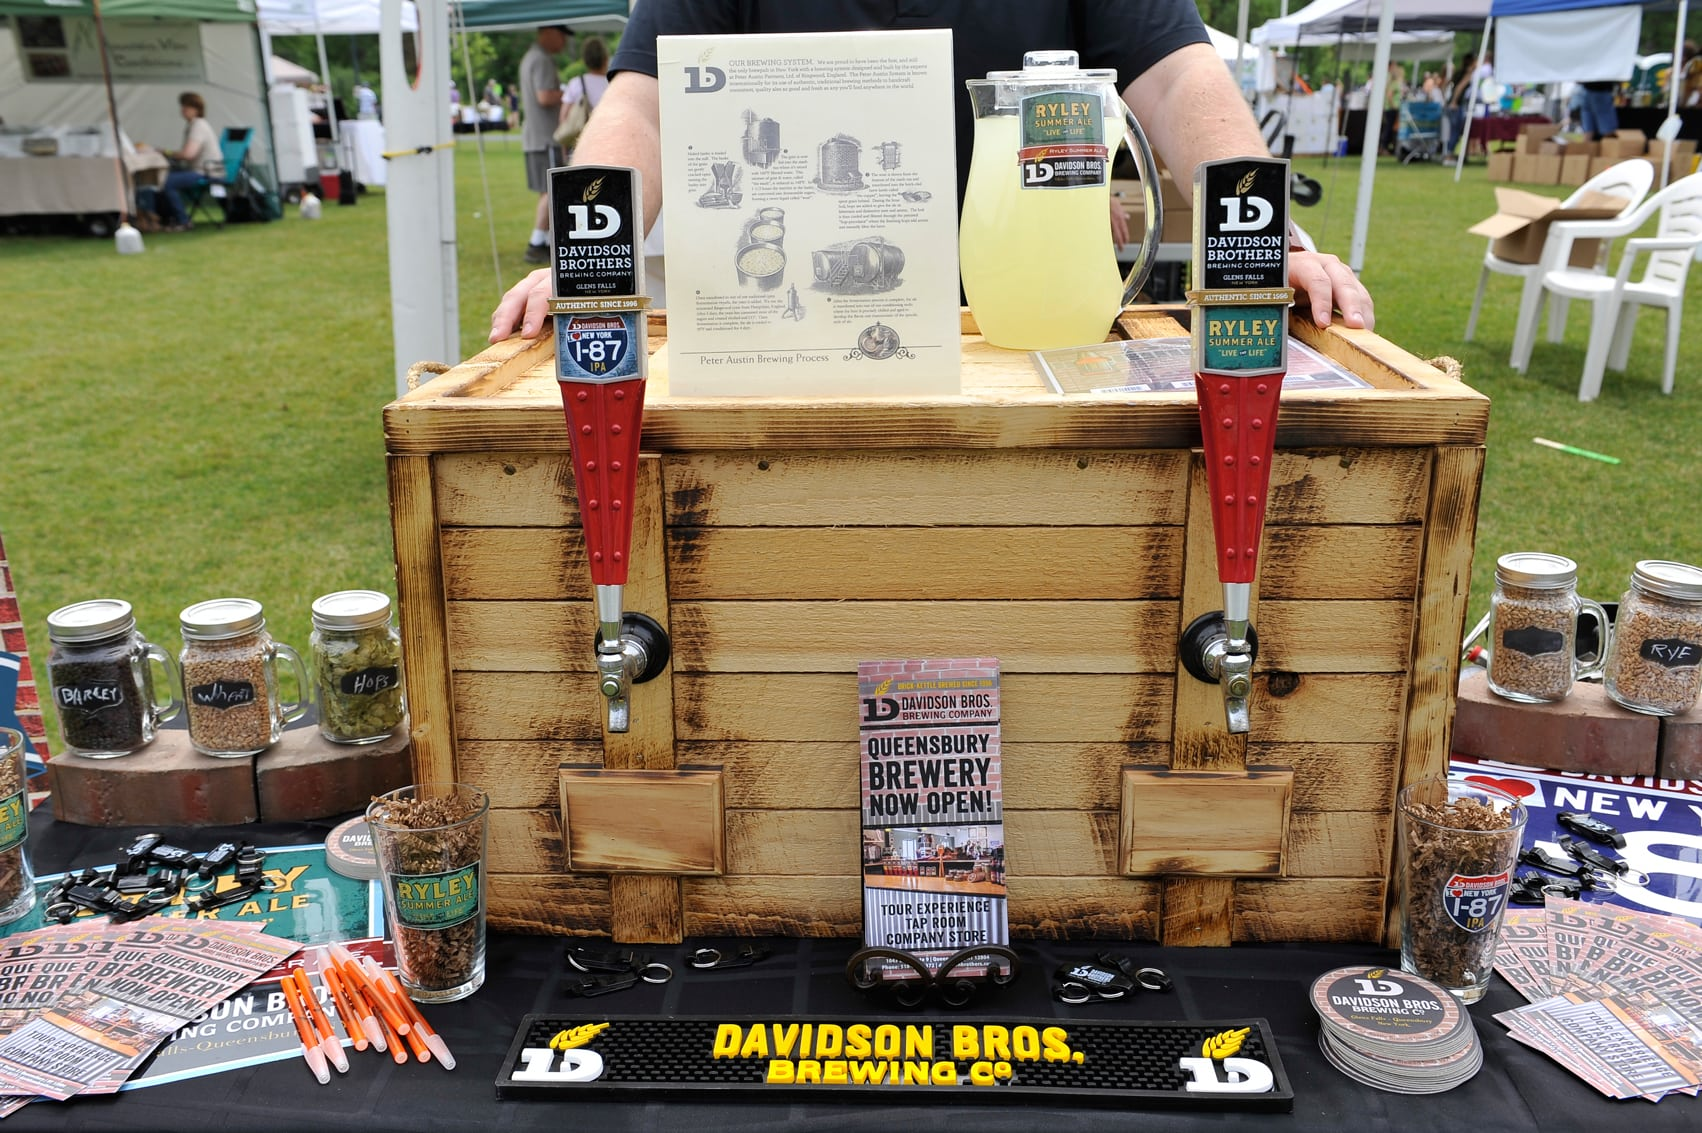 Davidsons-setup